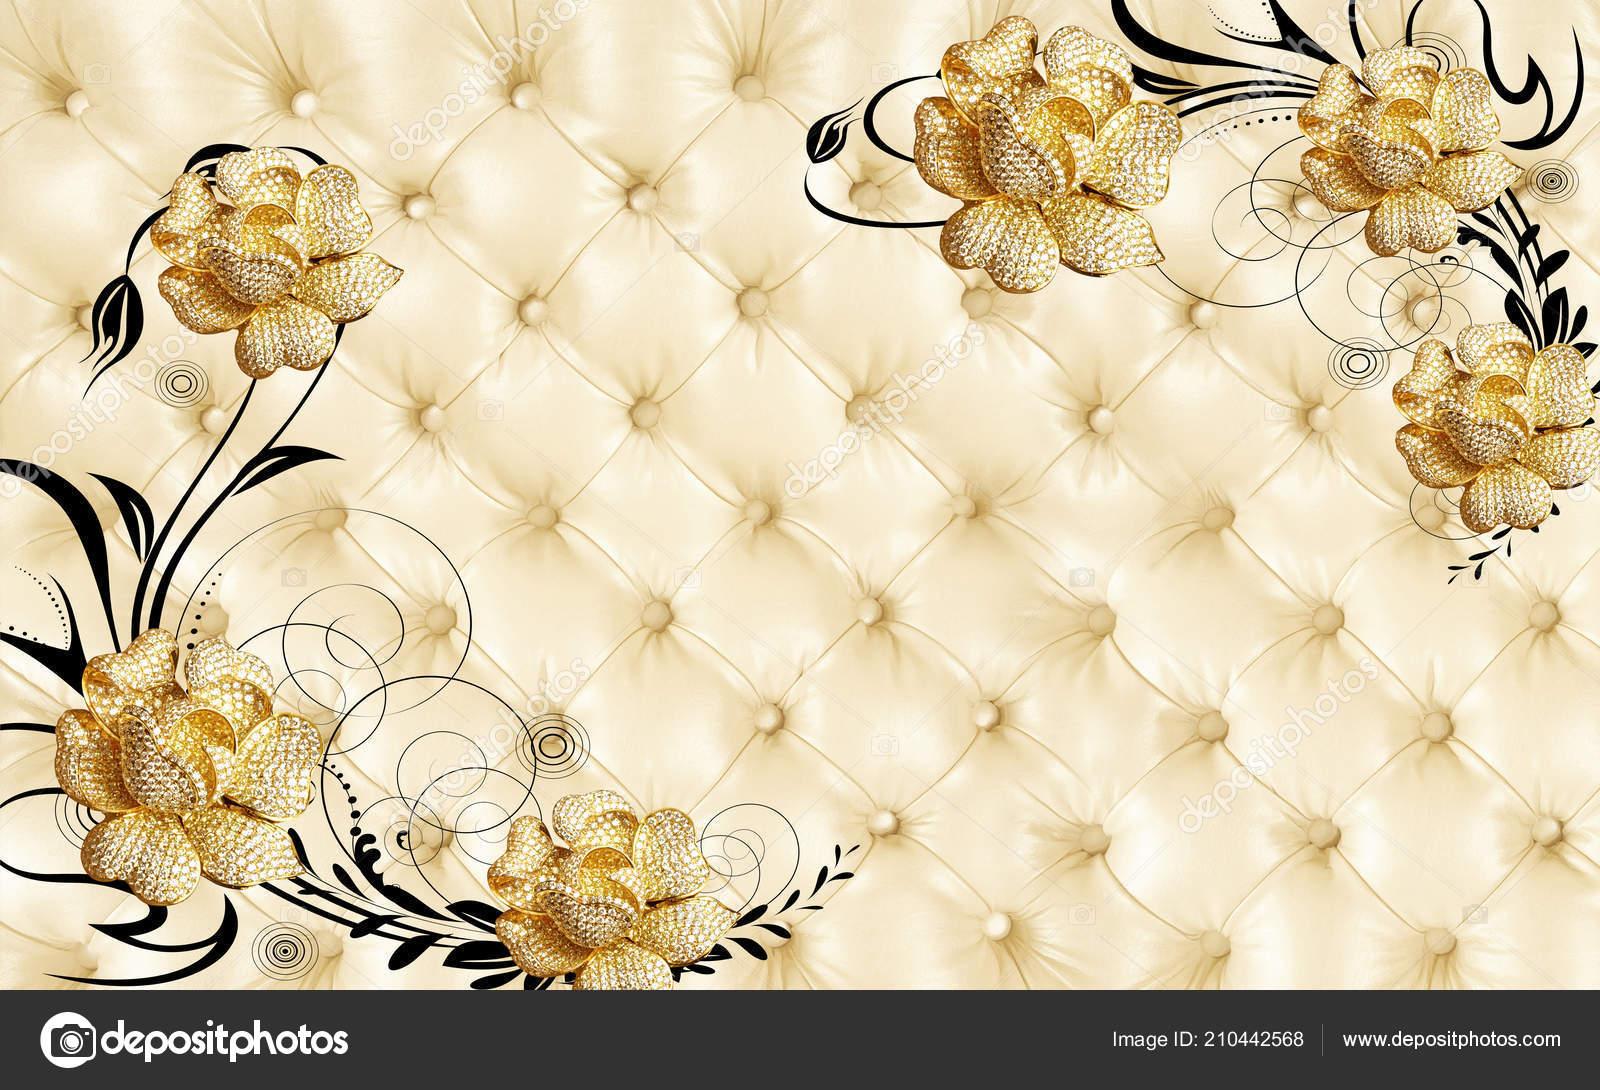 Background Jewellery Wallpaper Golden Jewelry Flower